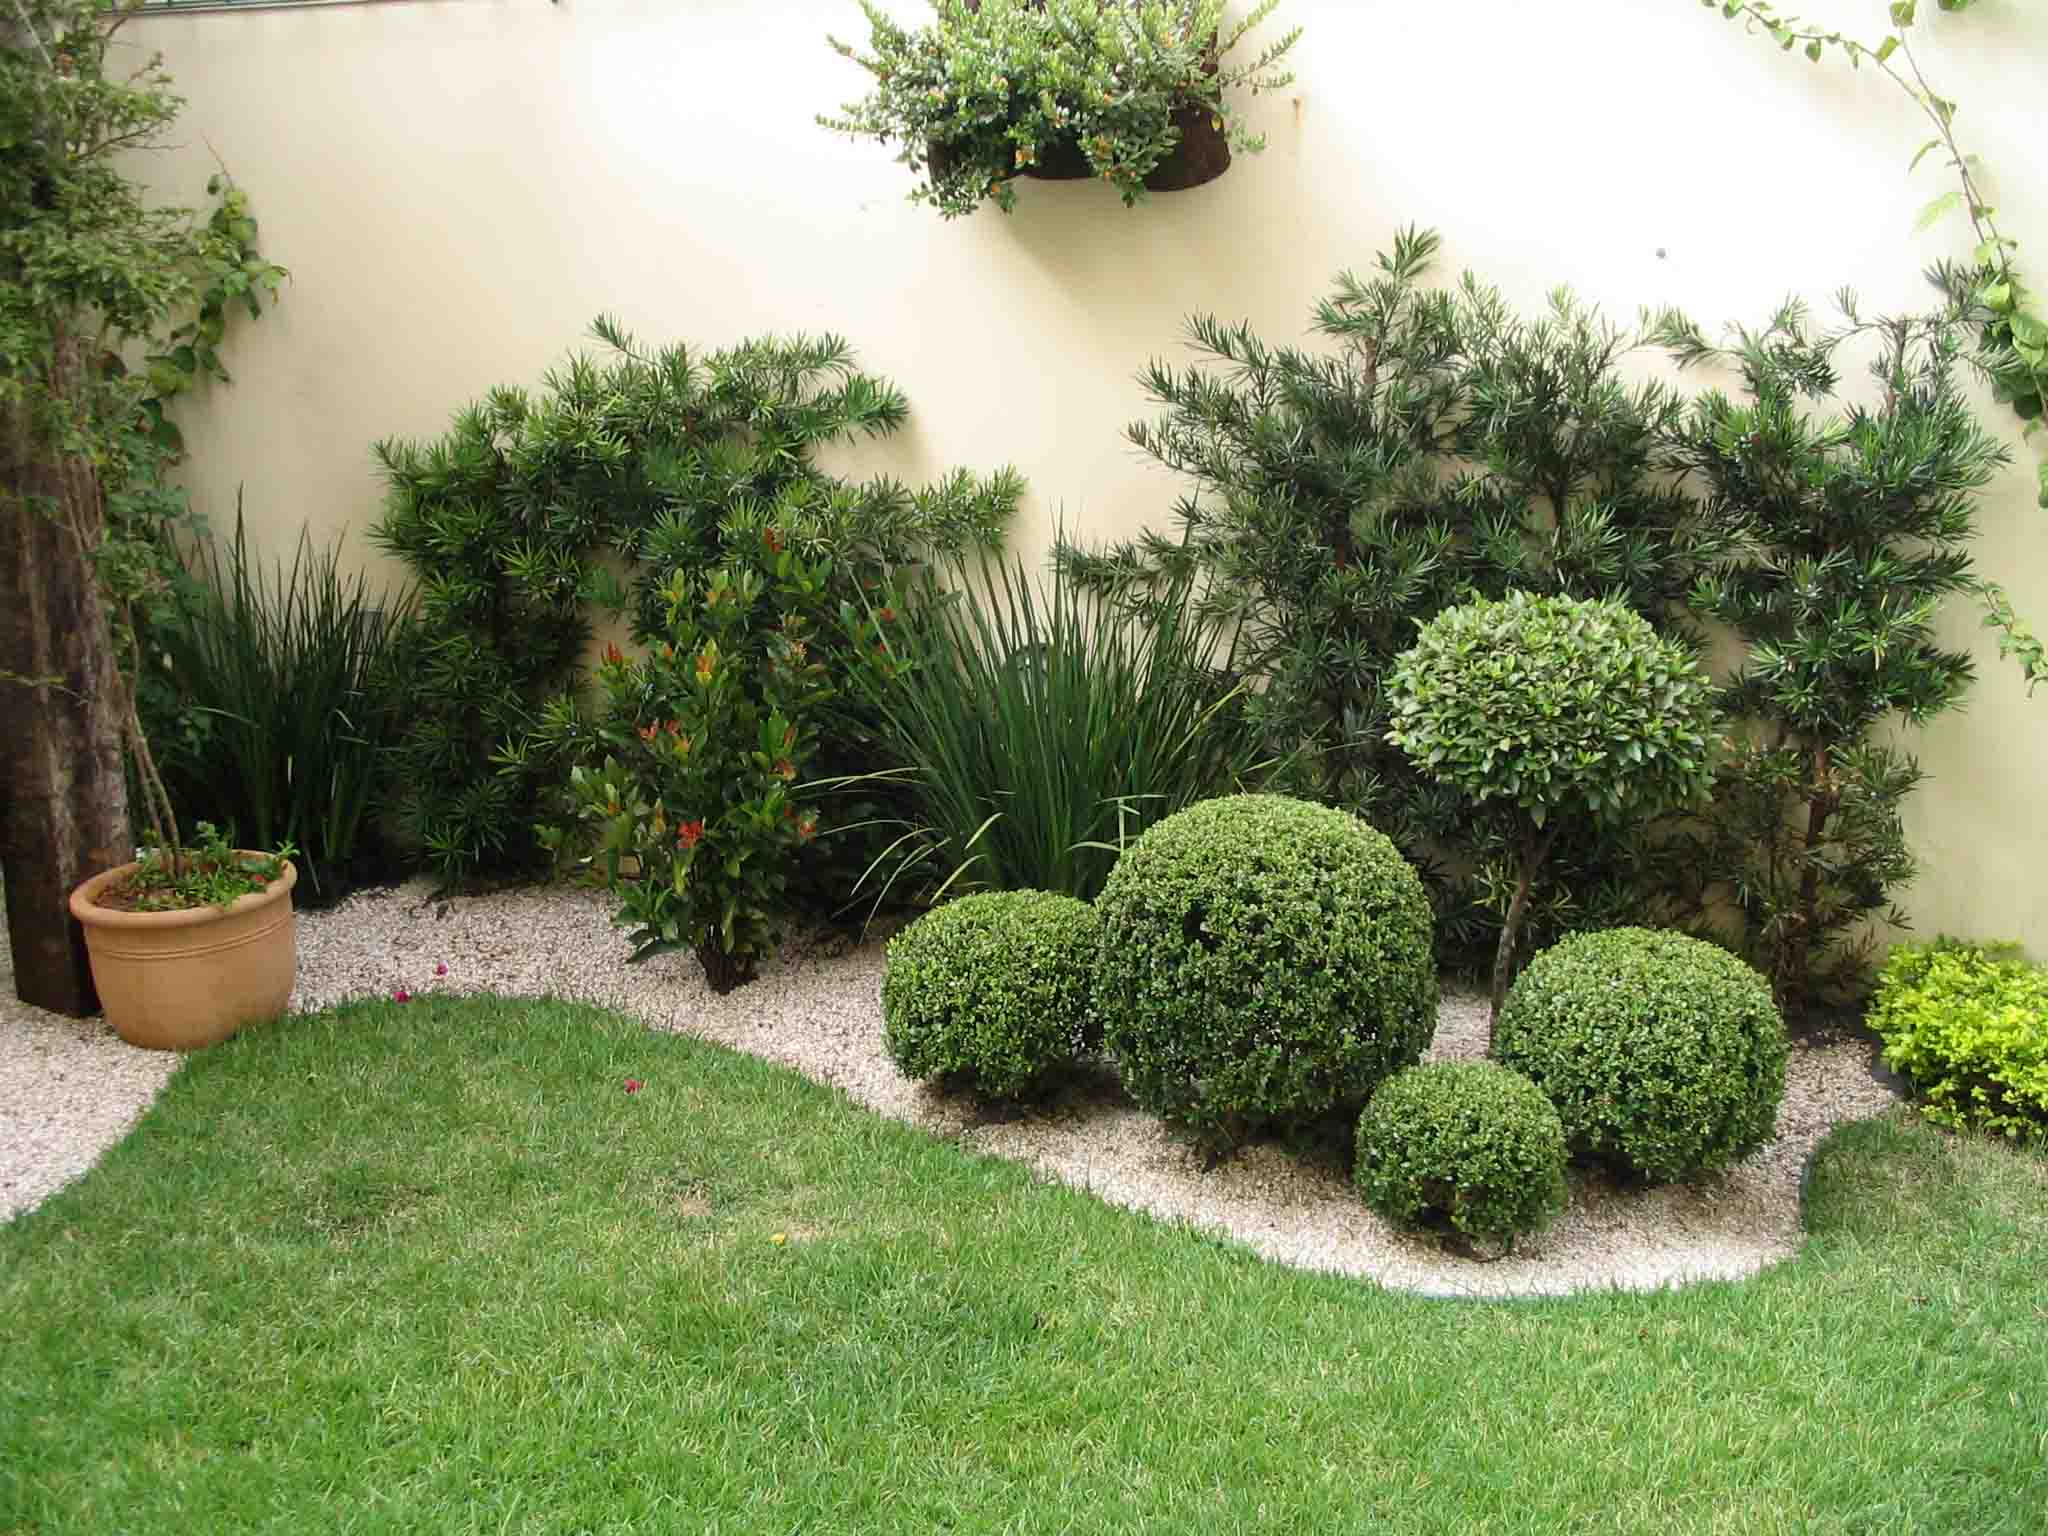 decorar um jardim : decorar um jardim:Decoracao De Jardim Pequeno